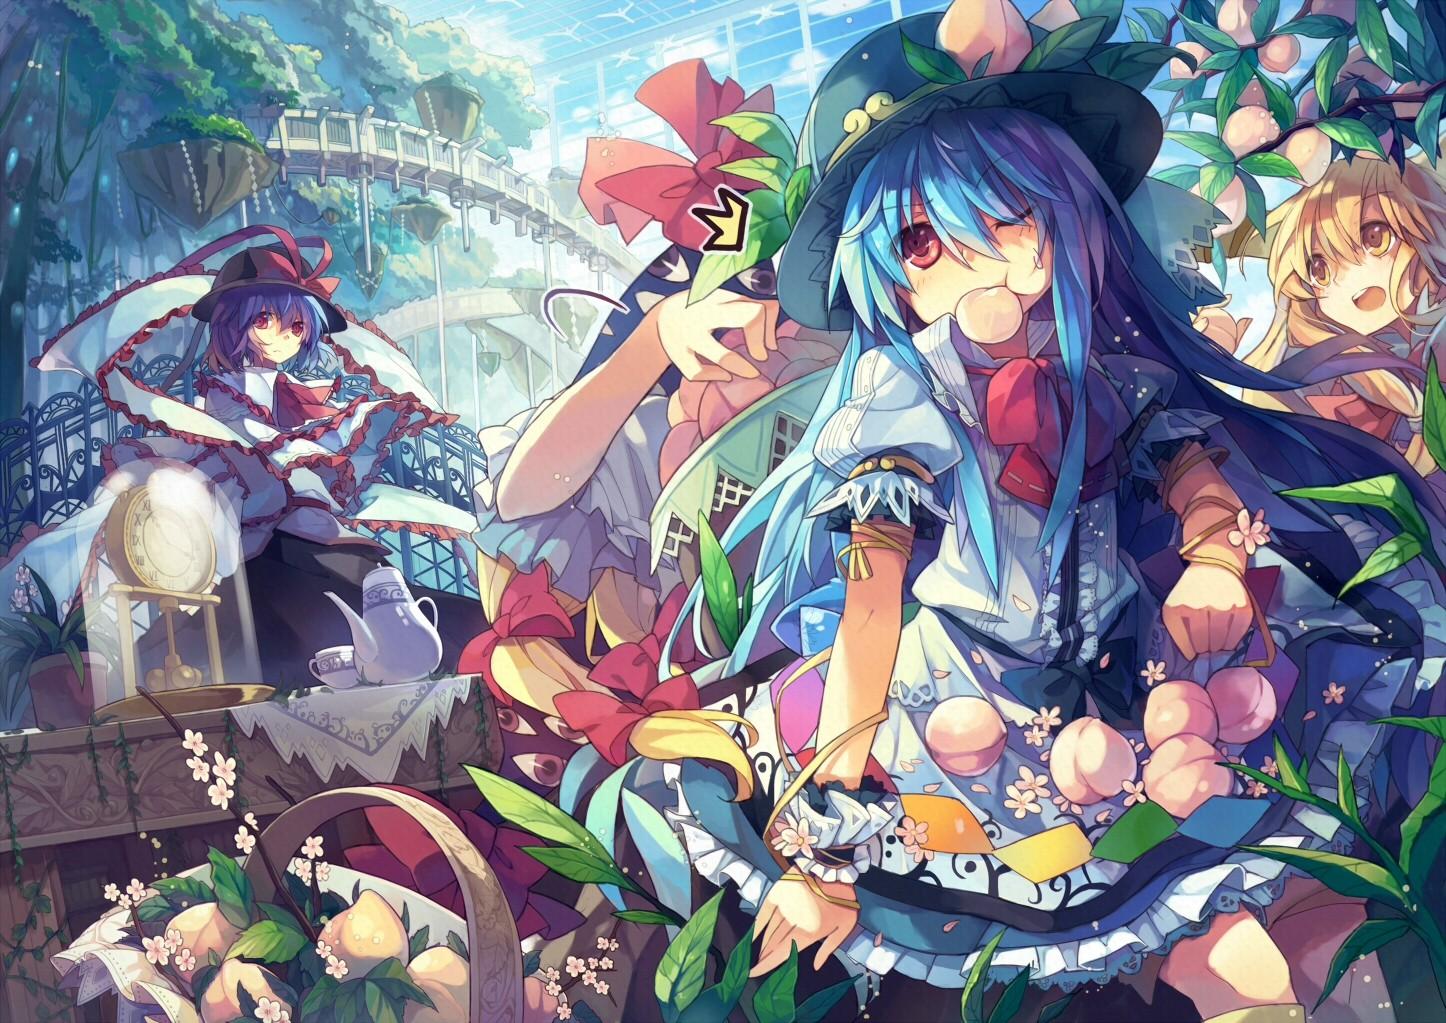 Fondos De Pantalla Anime Chicas Anime Touhou